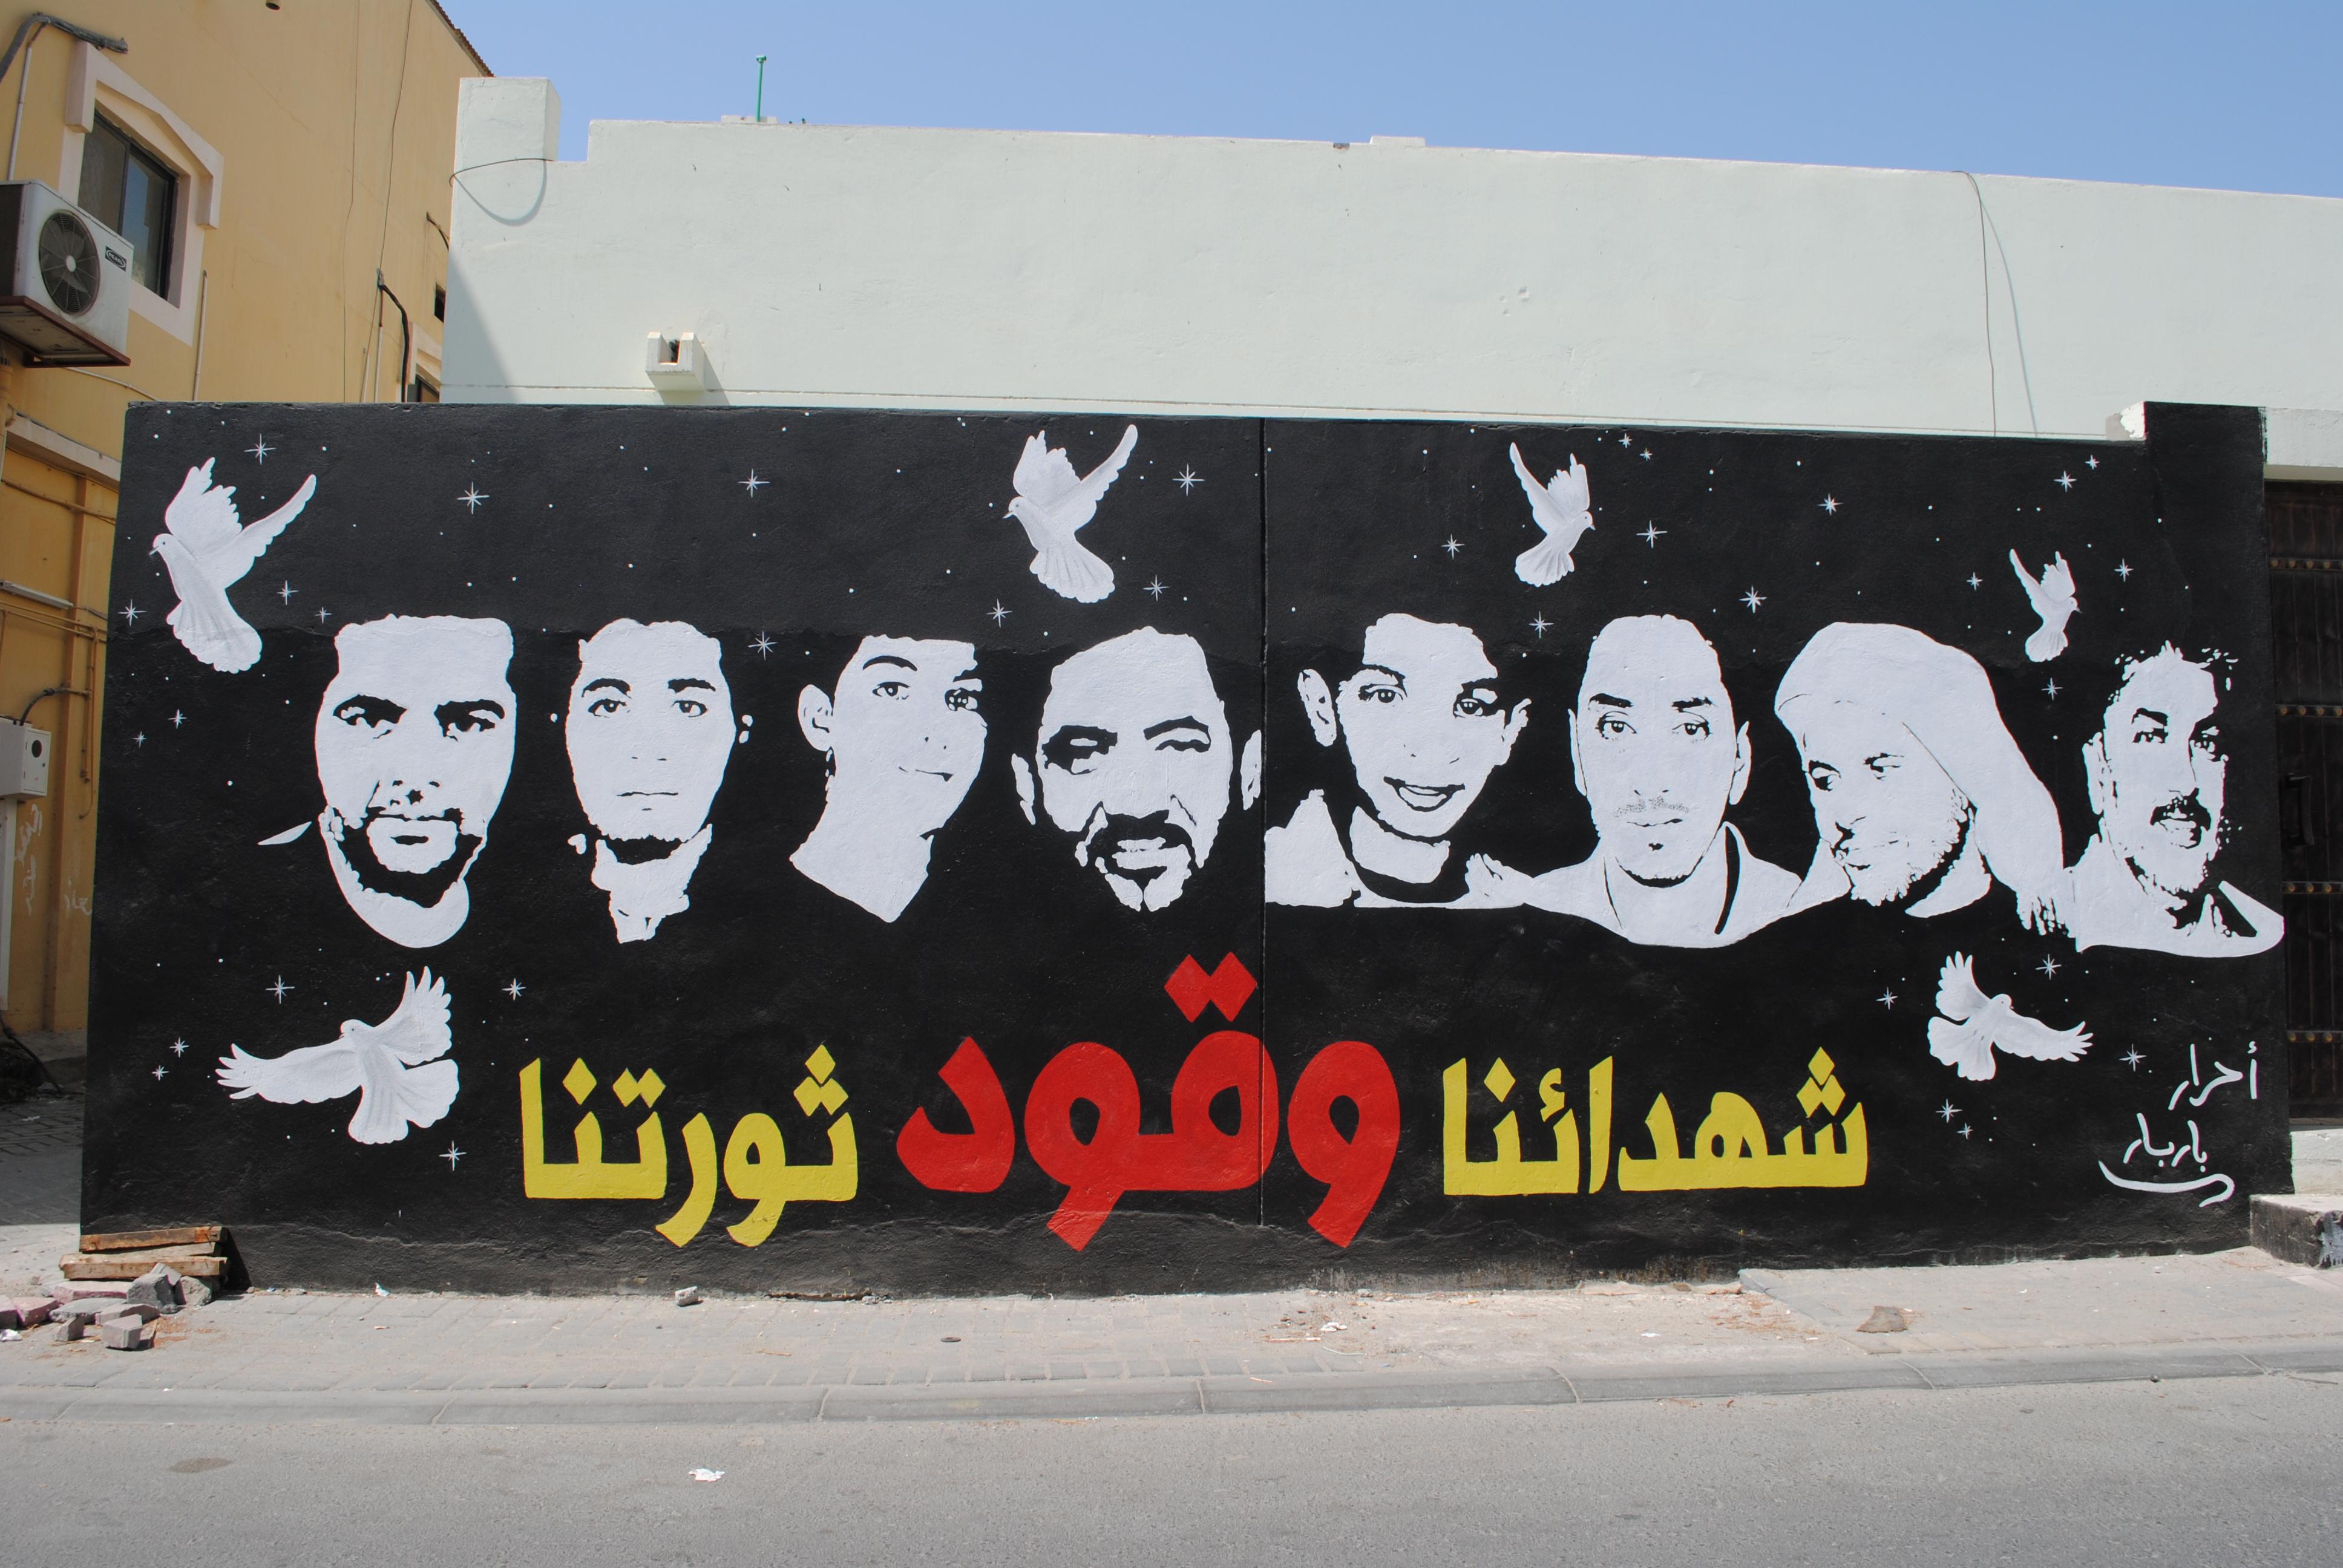 Bahrain_uprising_graffiti_in_Barbar_(6)